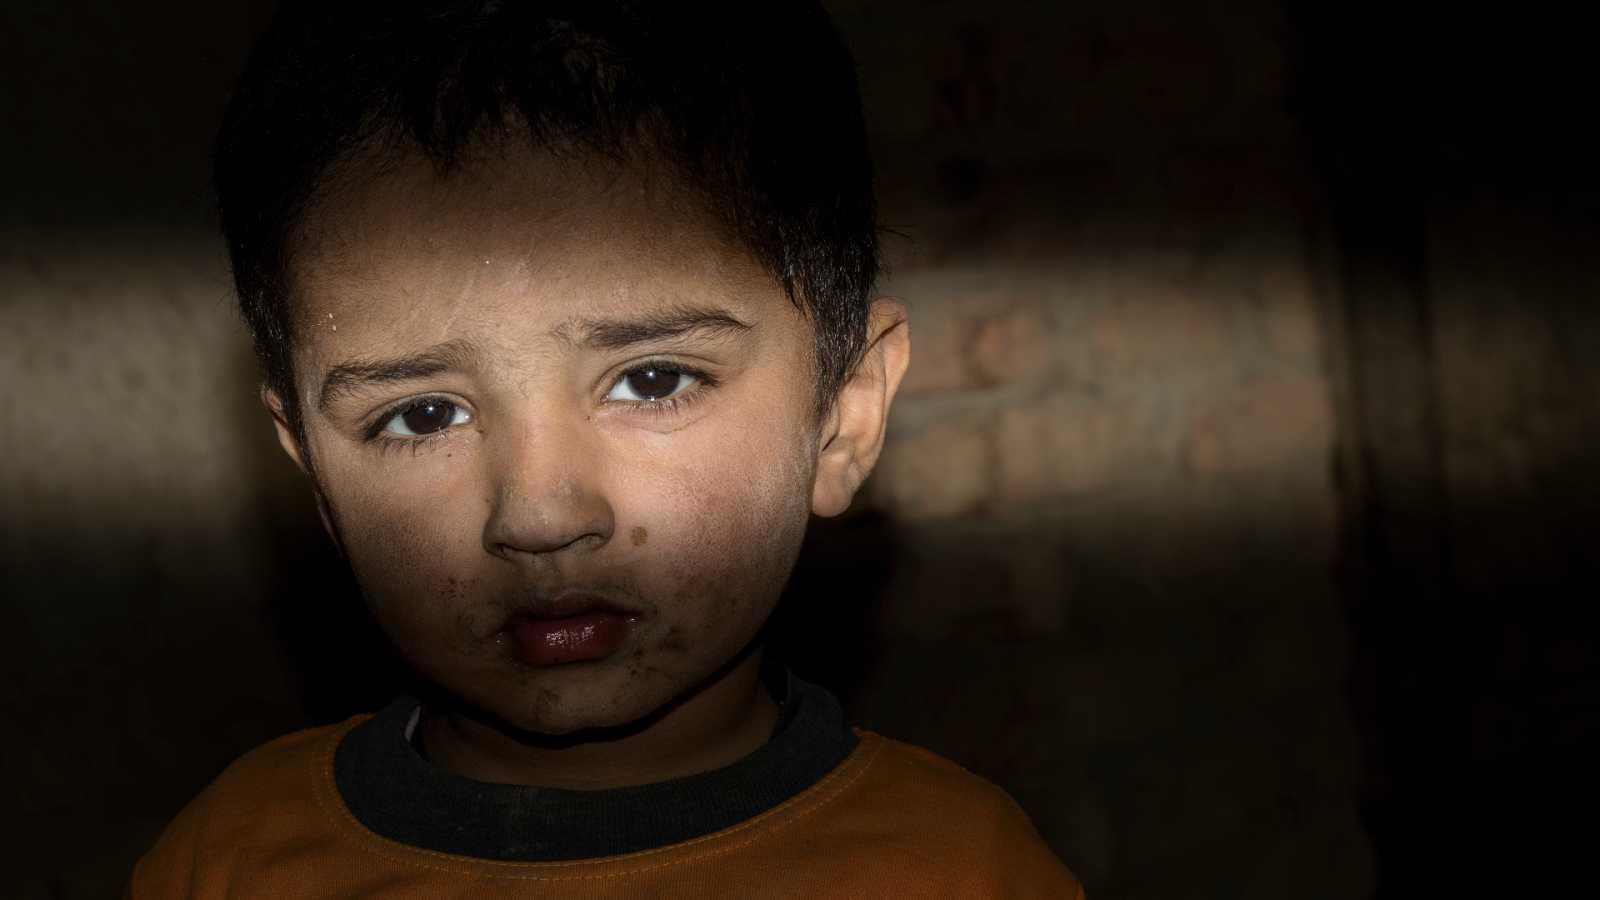 Cinco continentes - Infancia: objetivo bélico - Escuchar ahora